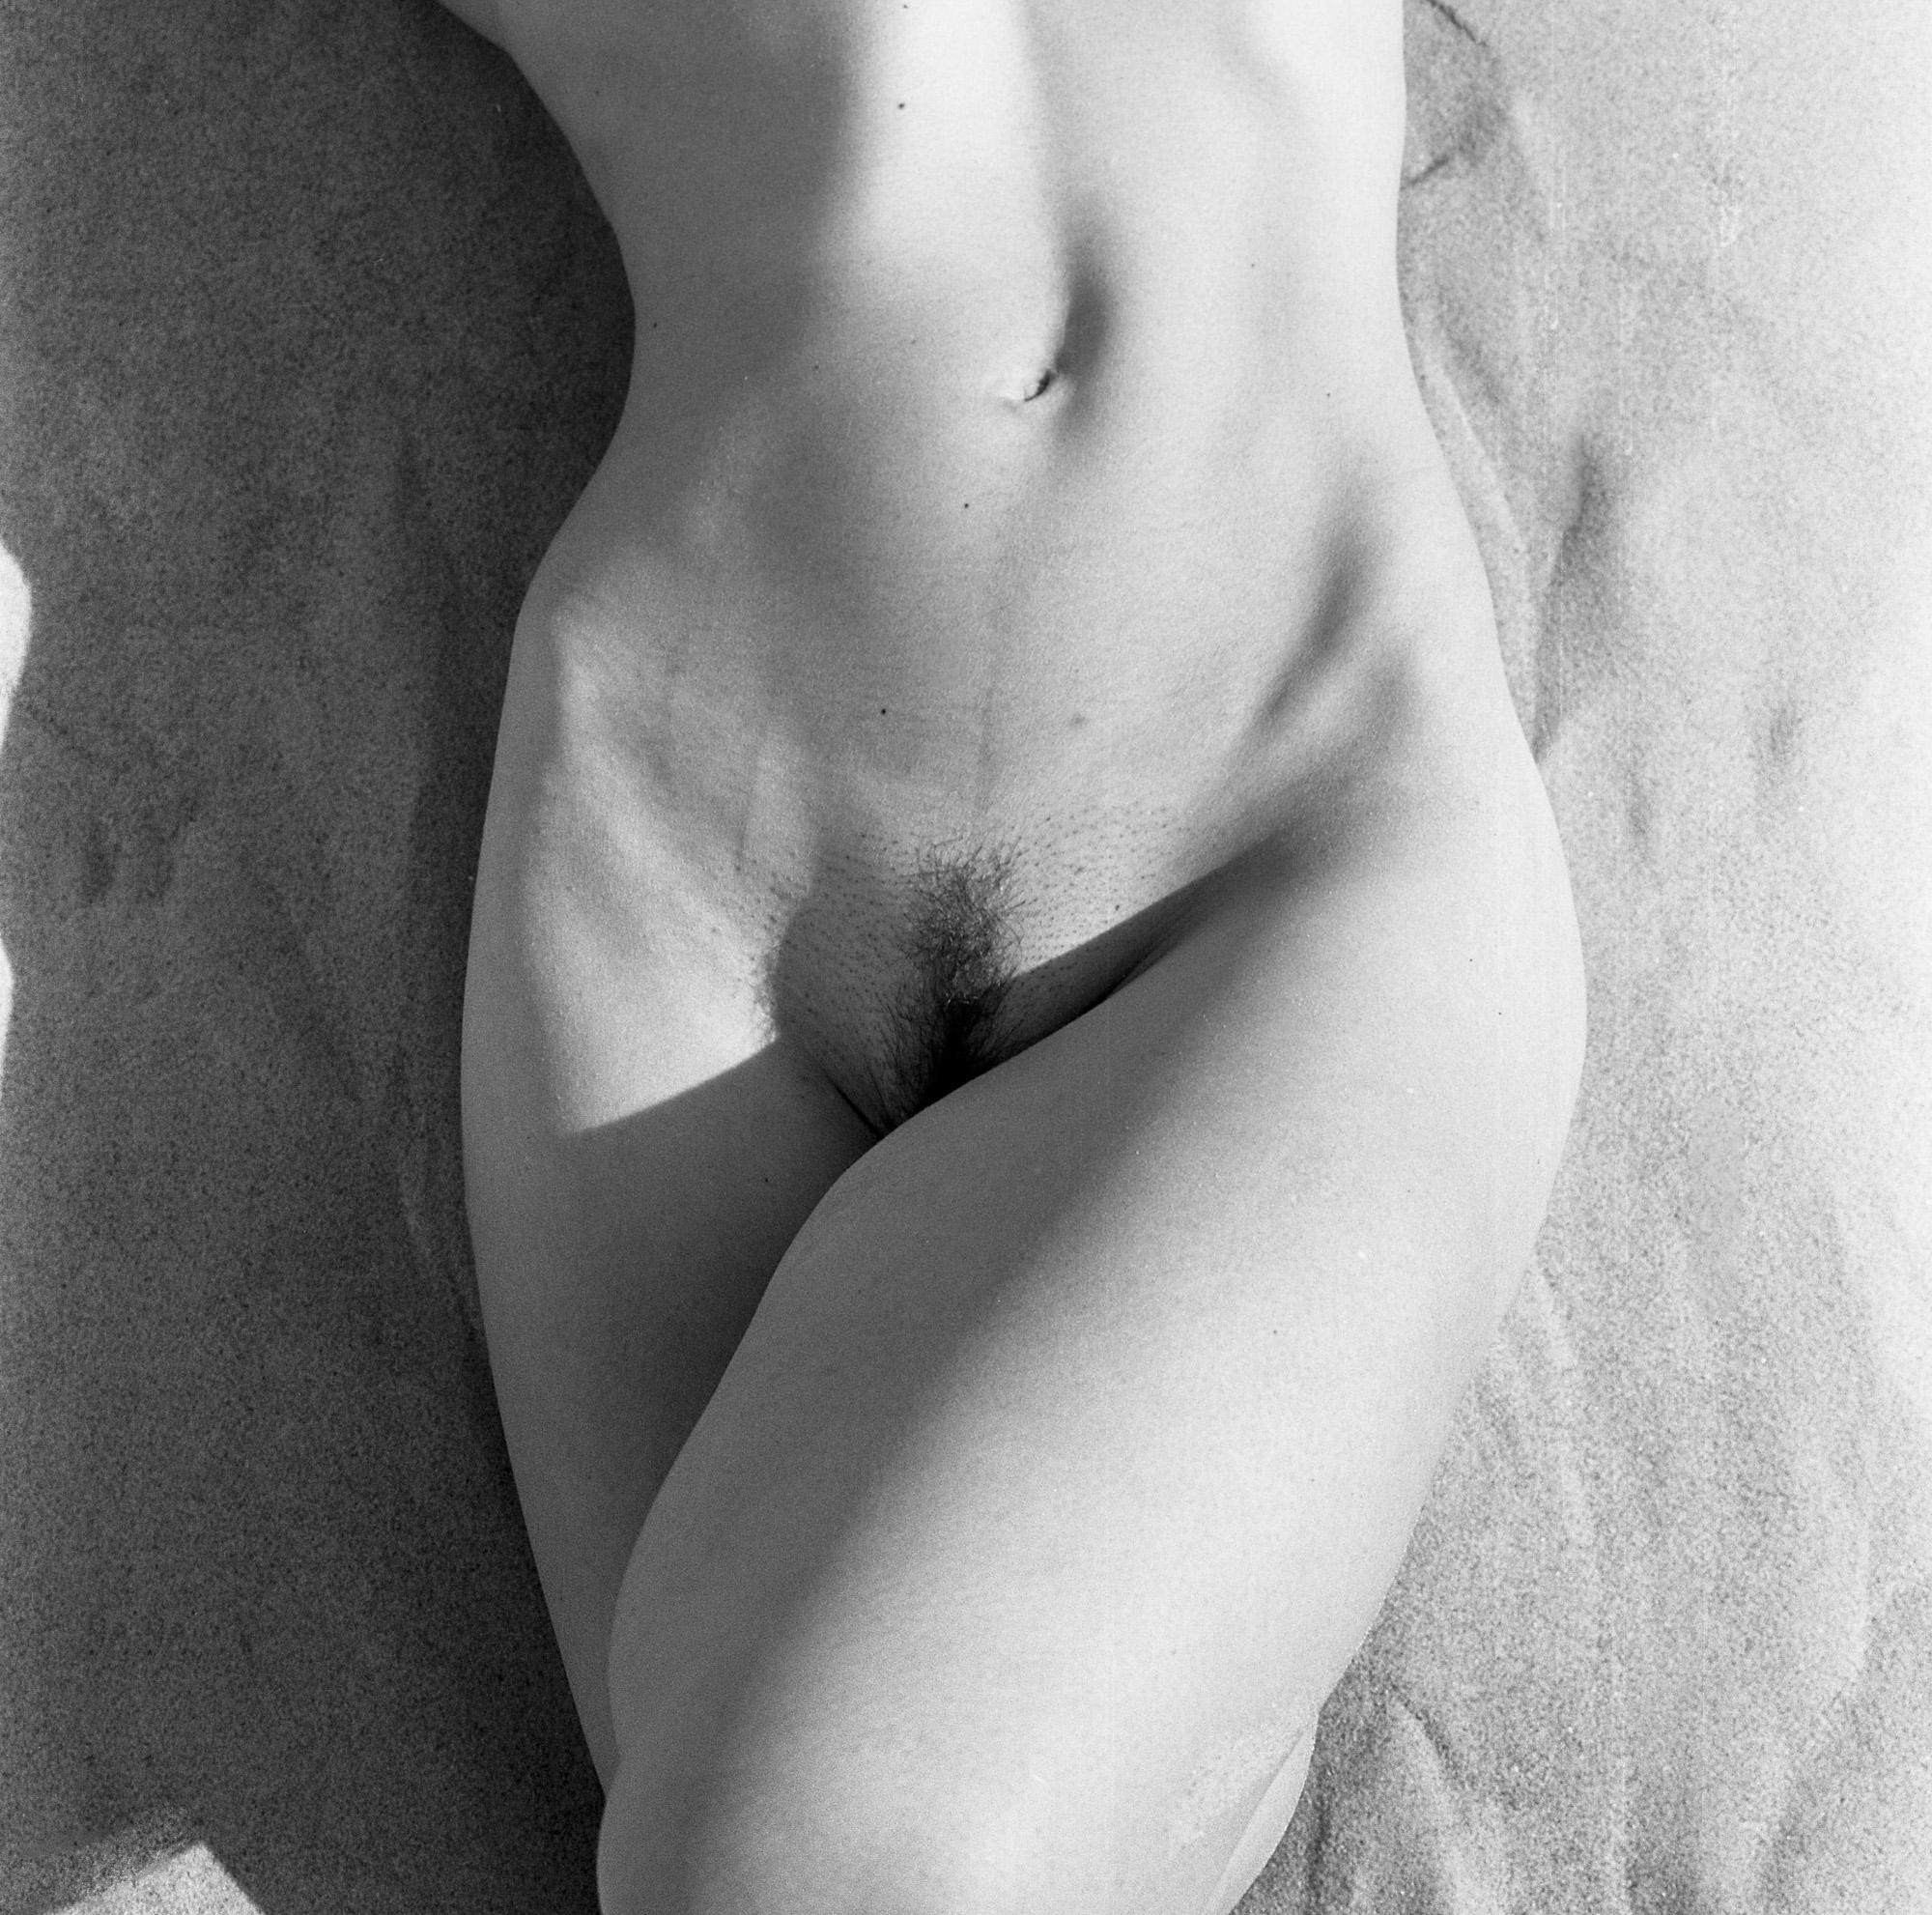 Henrikson Archive Nudes web_39.jpg